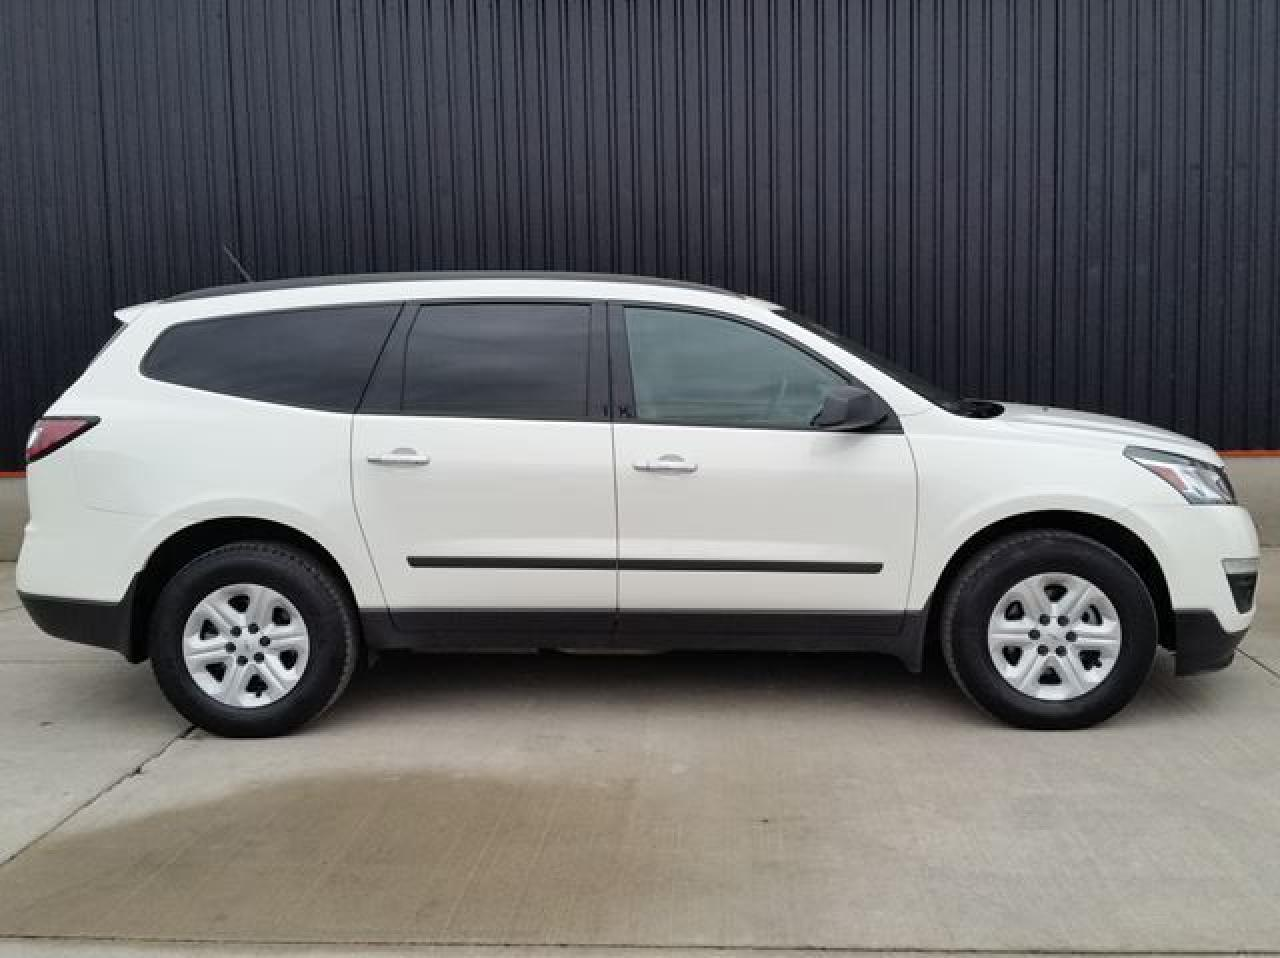 Photo of White 2015 Chevrolet Traverse